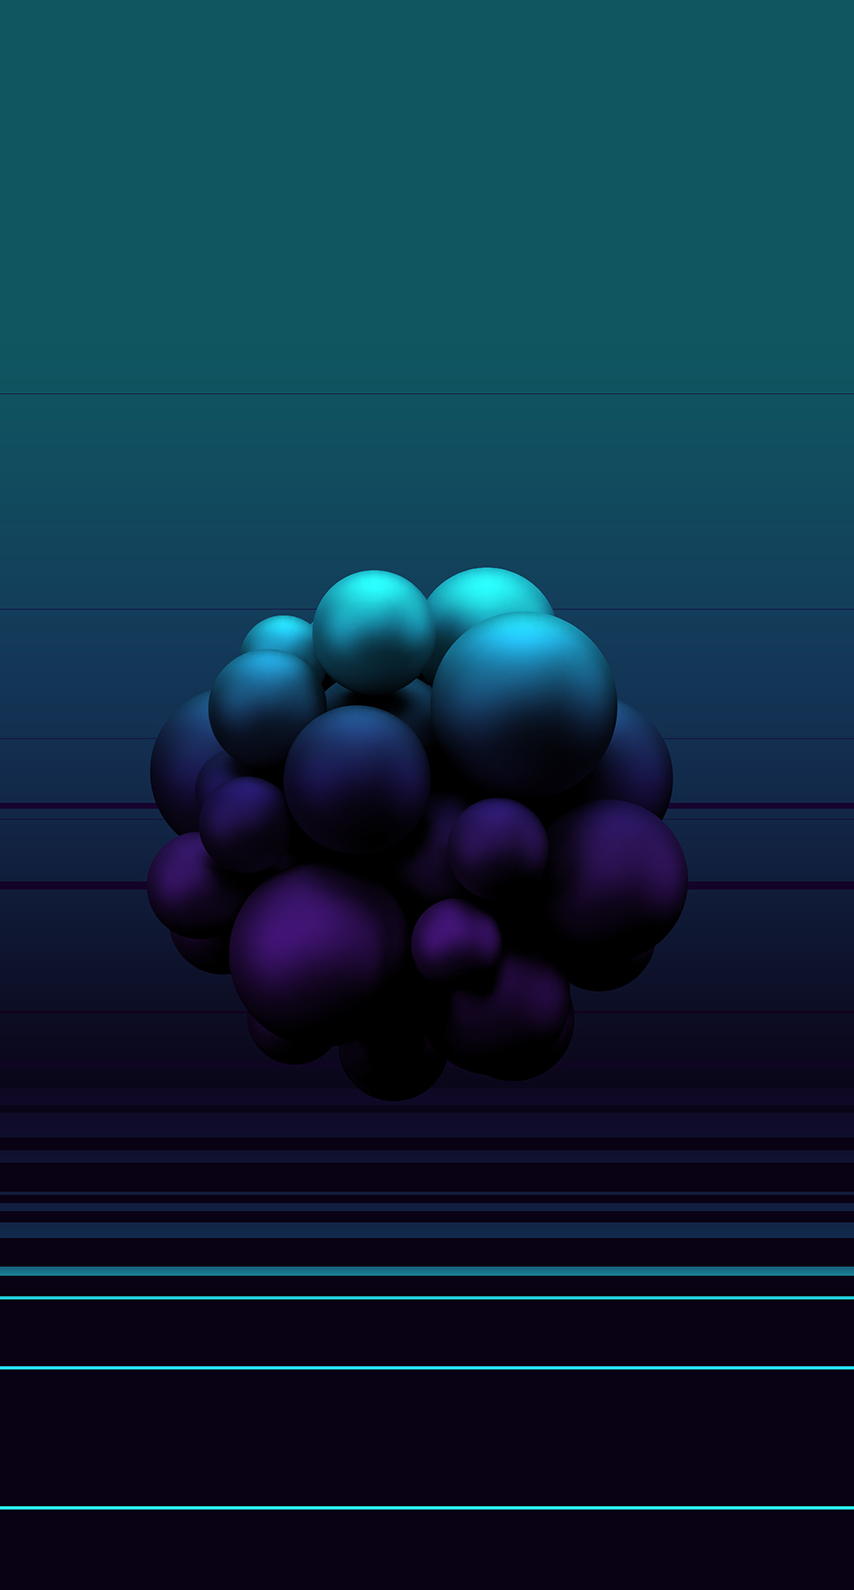 sphere, shining